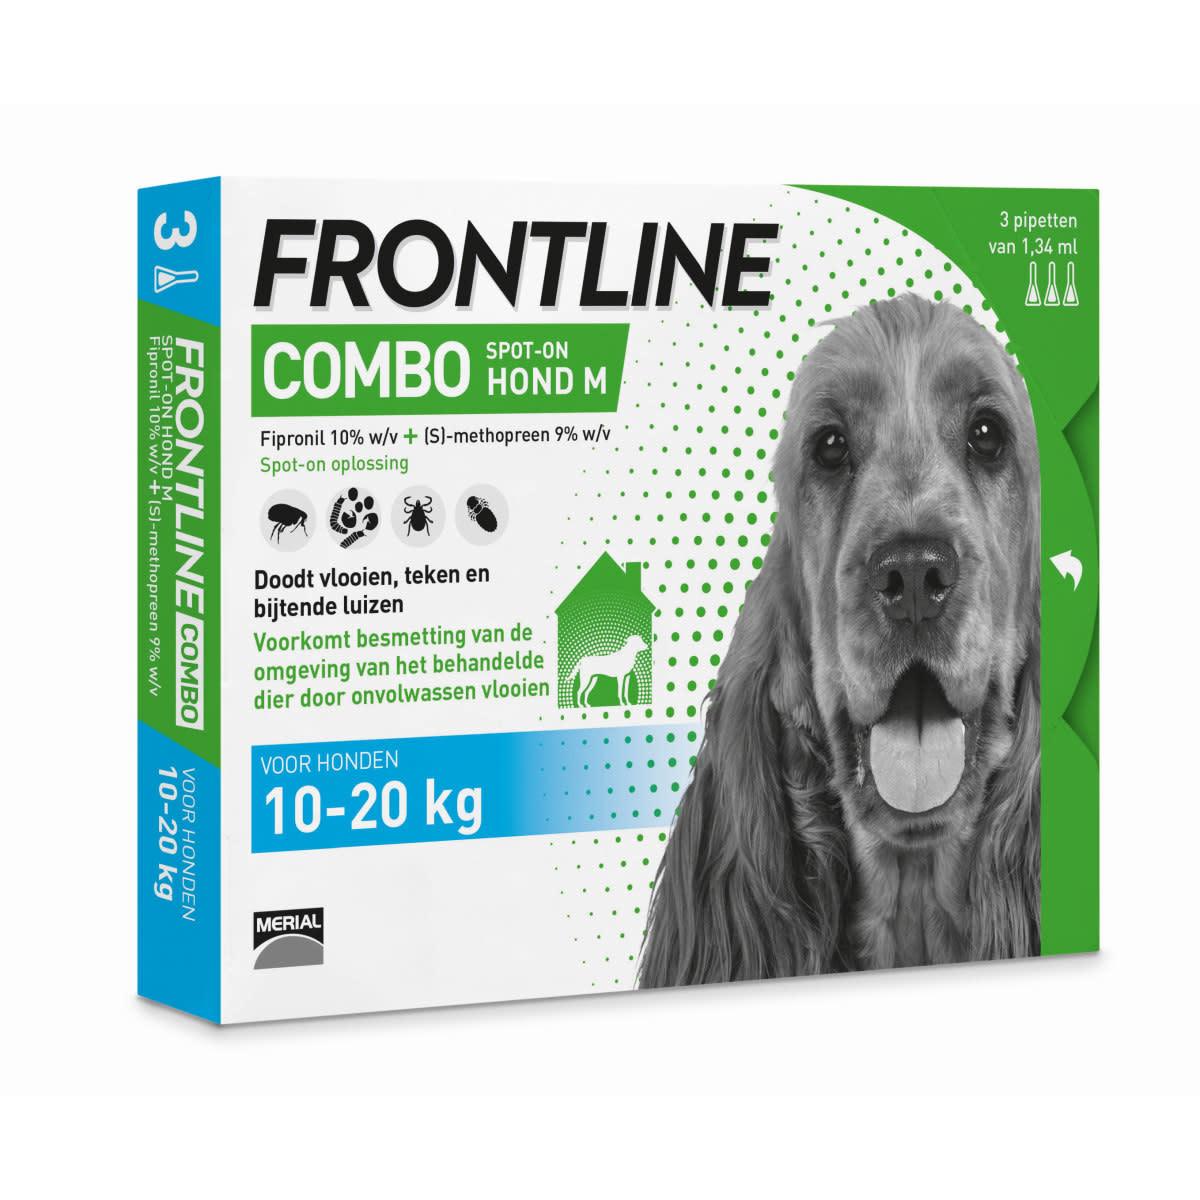 Frontline FRONTLINE - COMBO 3 PIPETTEN M